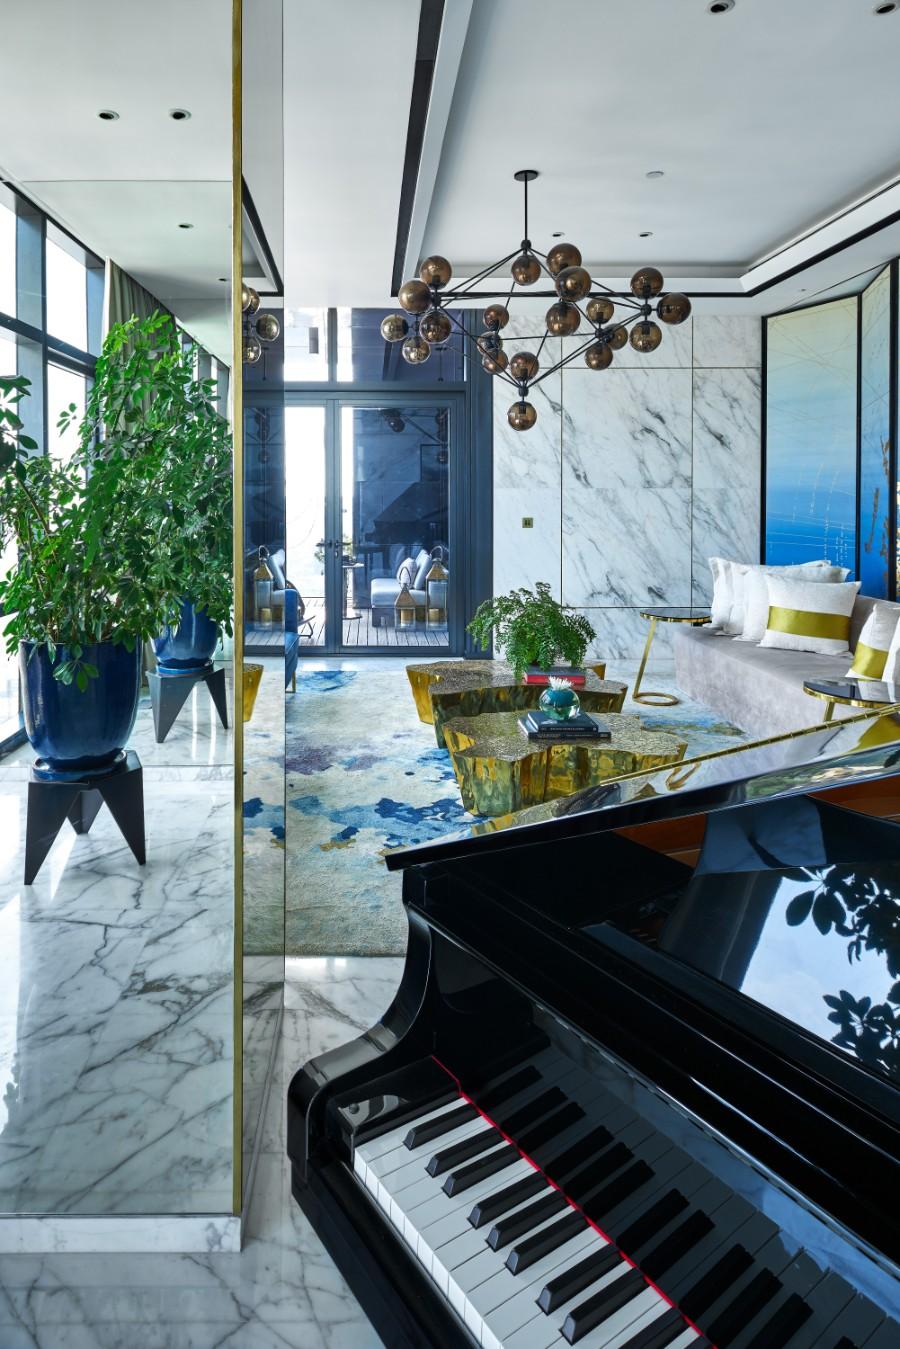 exclusive design Exclusive Design: Altamount Residence by Hirsch Bedner Associates Inside Altamount Residence by Hirsch Bedner Associates 33